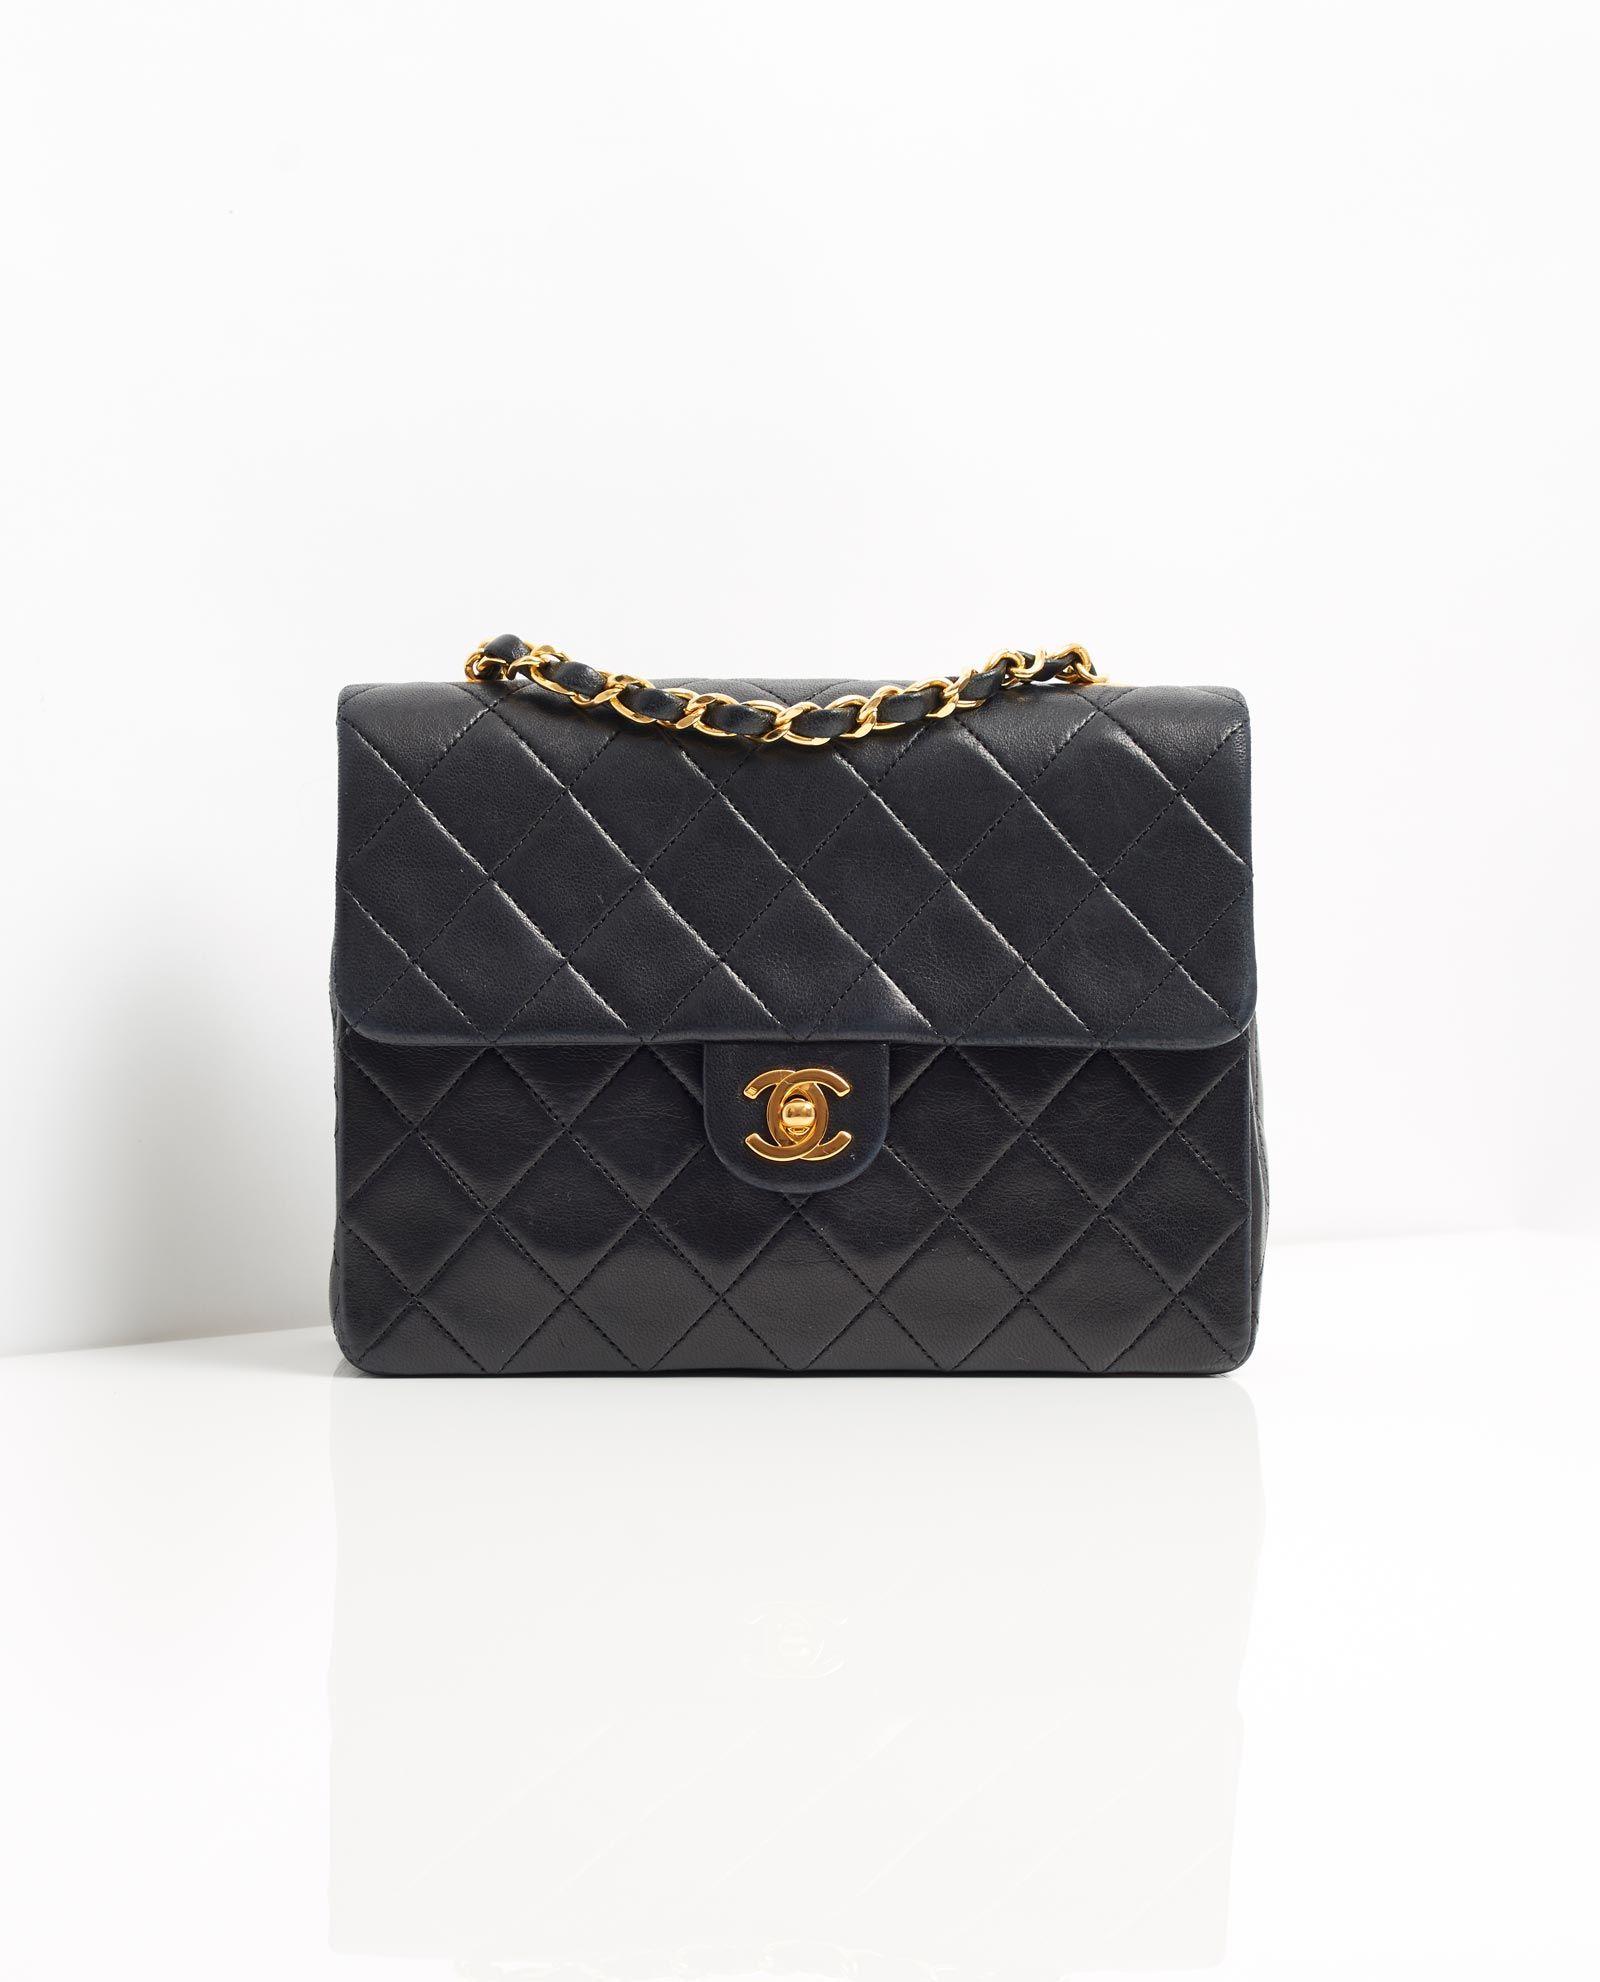 Vintage Chanel 8 Classic Flap Bag Classic Flap Bag Bags Chanel Bag